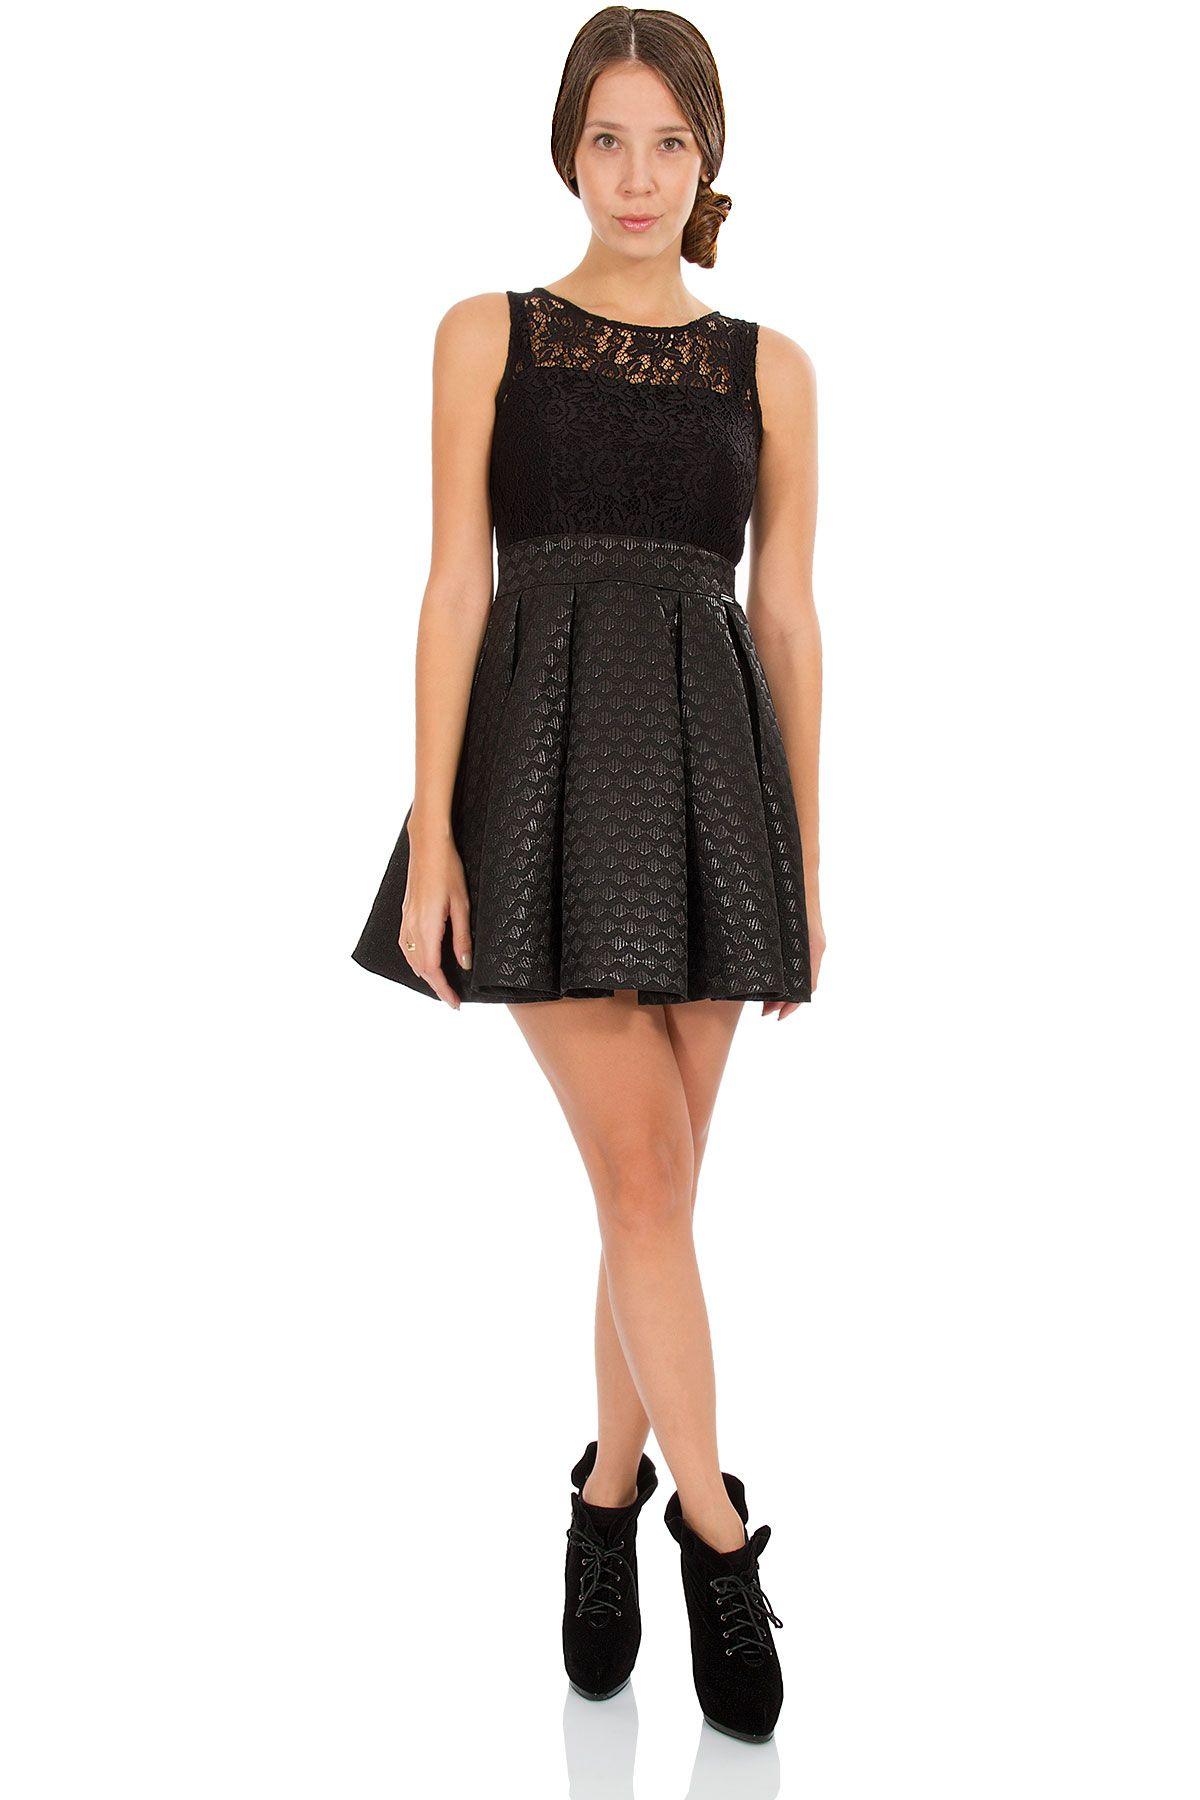 ce3d7f85f278 ΜΙΝΙ ΦΟΡΕΜΑ ΜΕ ΔΑΝΤΕΛΑ   Mini   Φορέματα    Matis Fashion